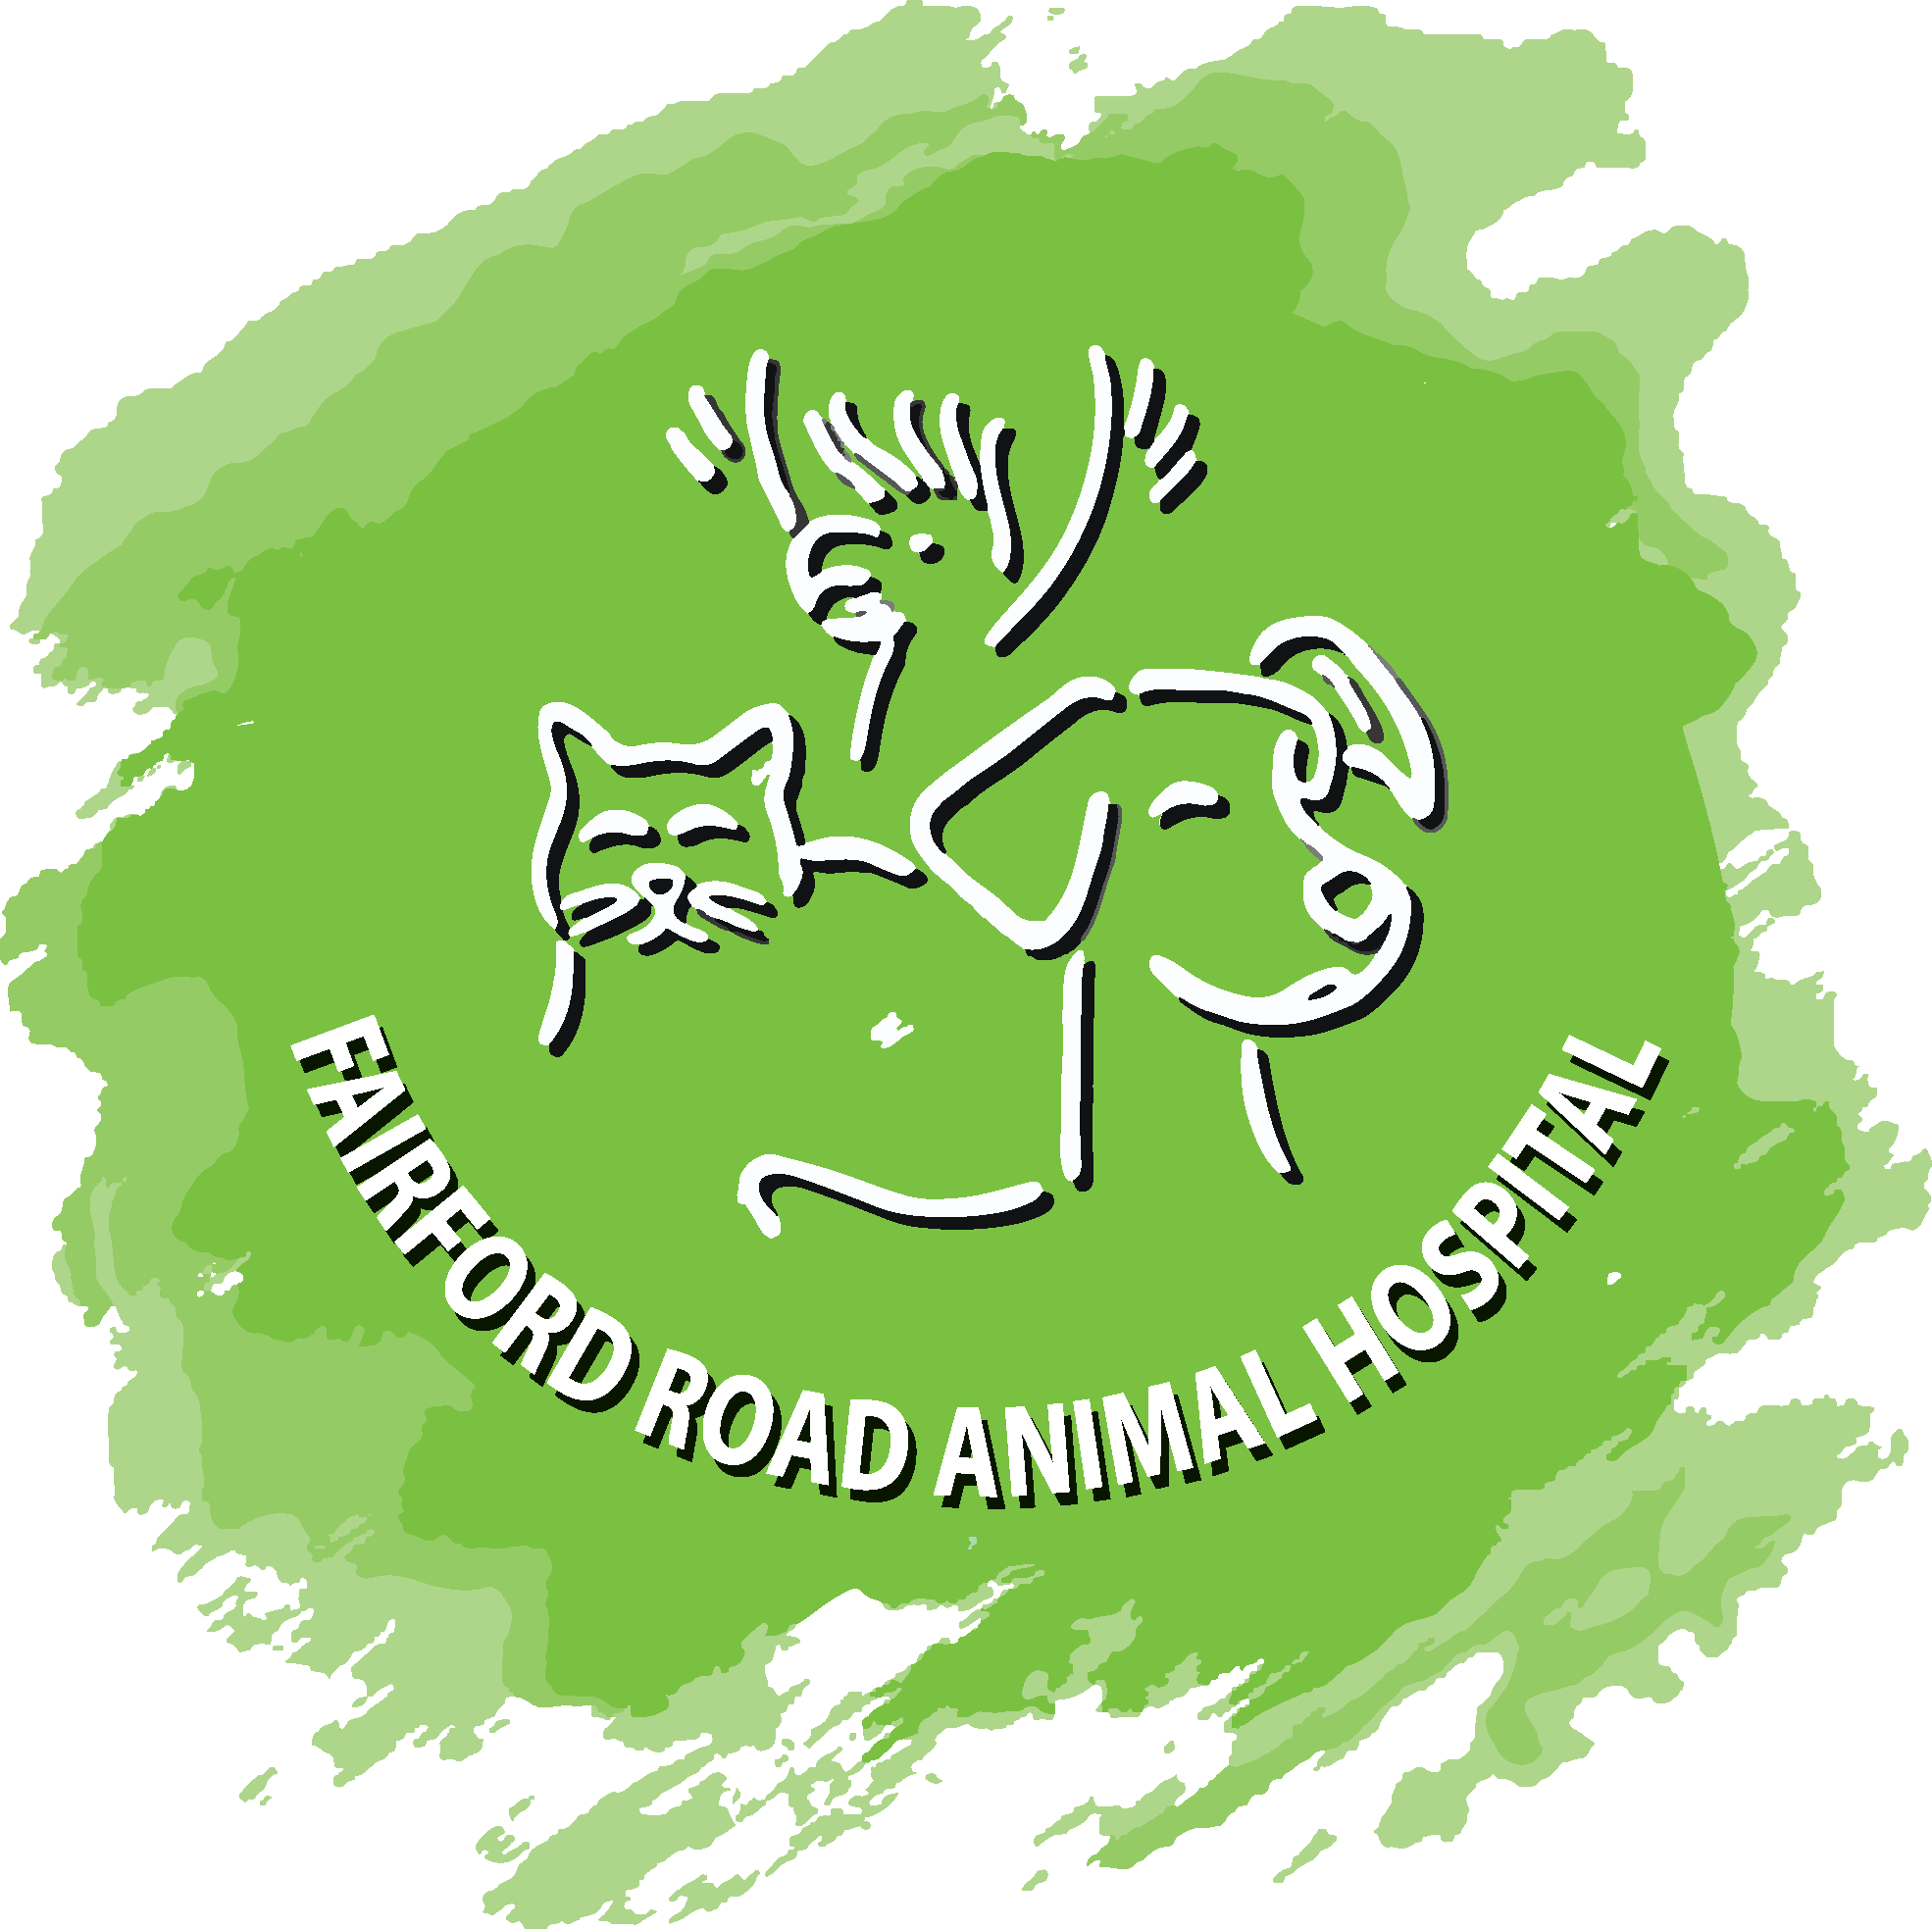 Fairford Road Animal Hospital